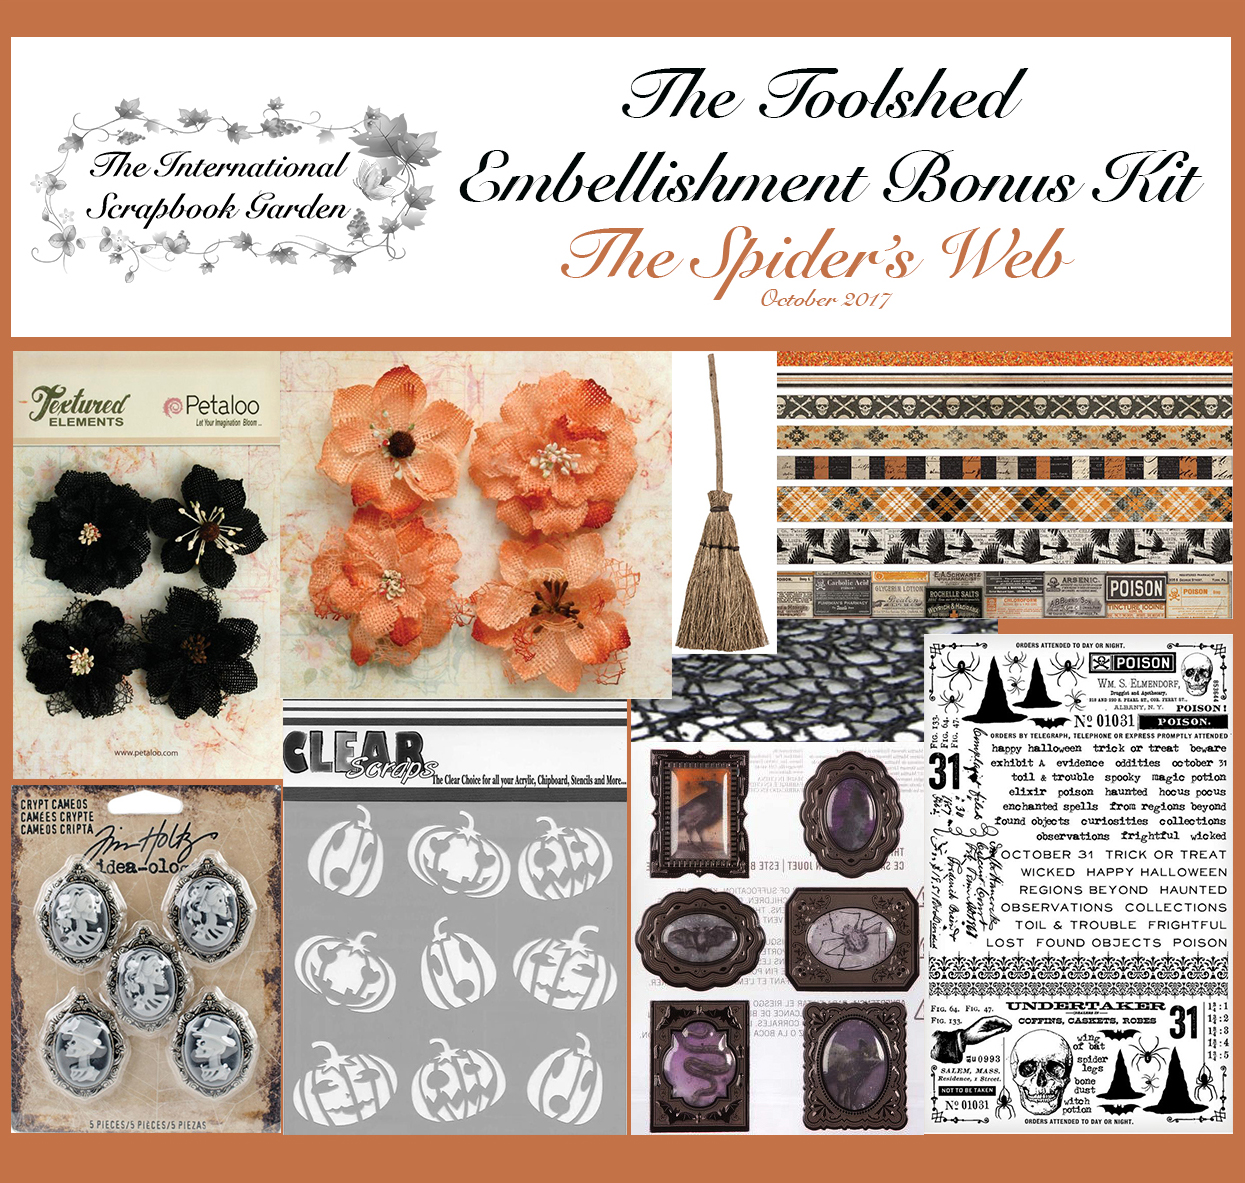 Tim Holtz Idea-ology Halloween Design Tape                                            Clear Scraps Jack-o-lantern Stencil                                        Tim Holtz Idea-ology Gothic Remnant Rubs                                              Petaloo Black Burlap Blossoms